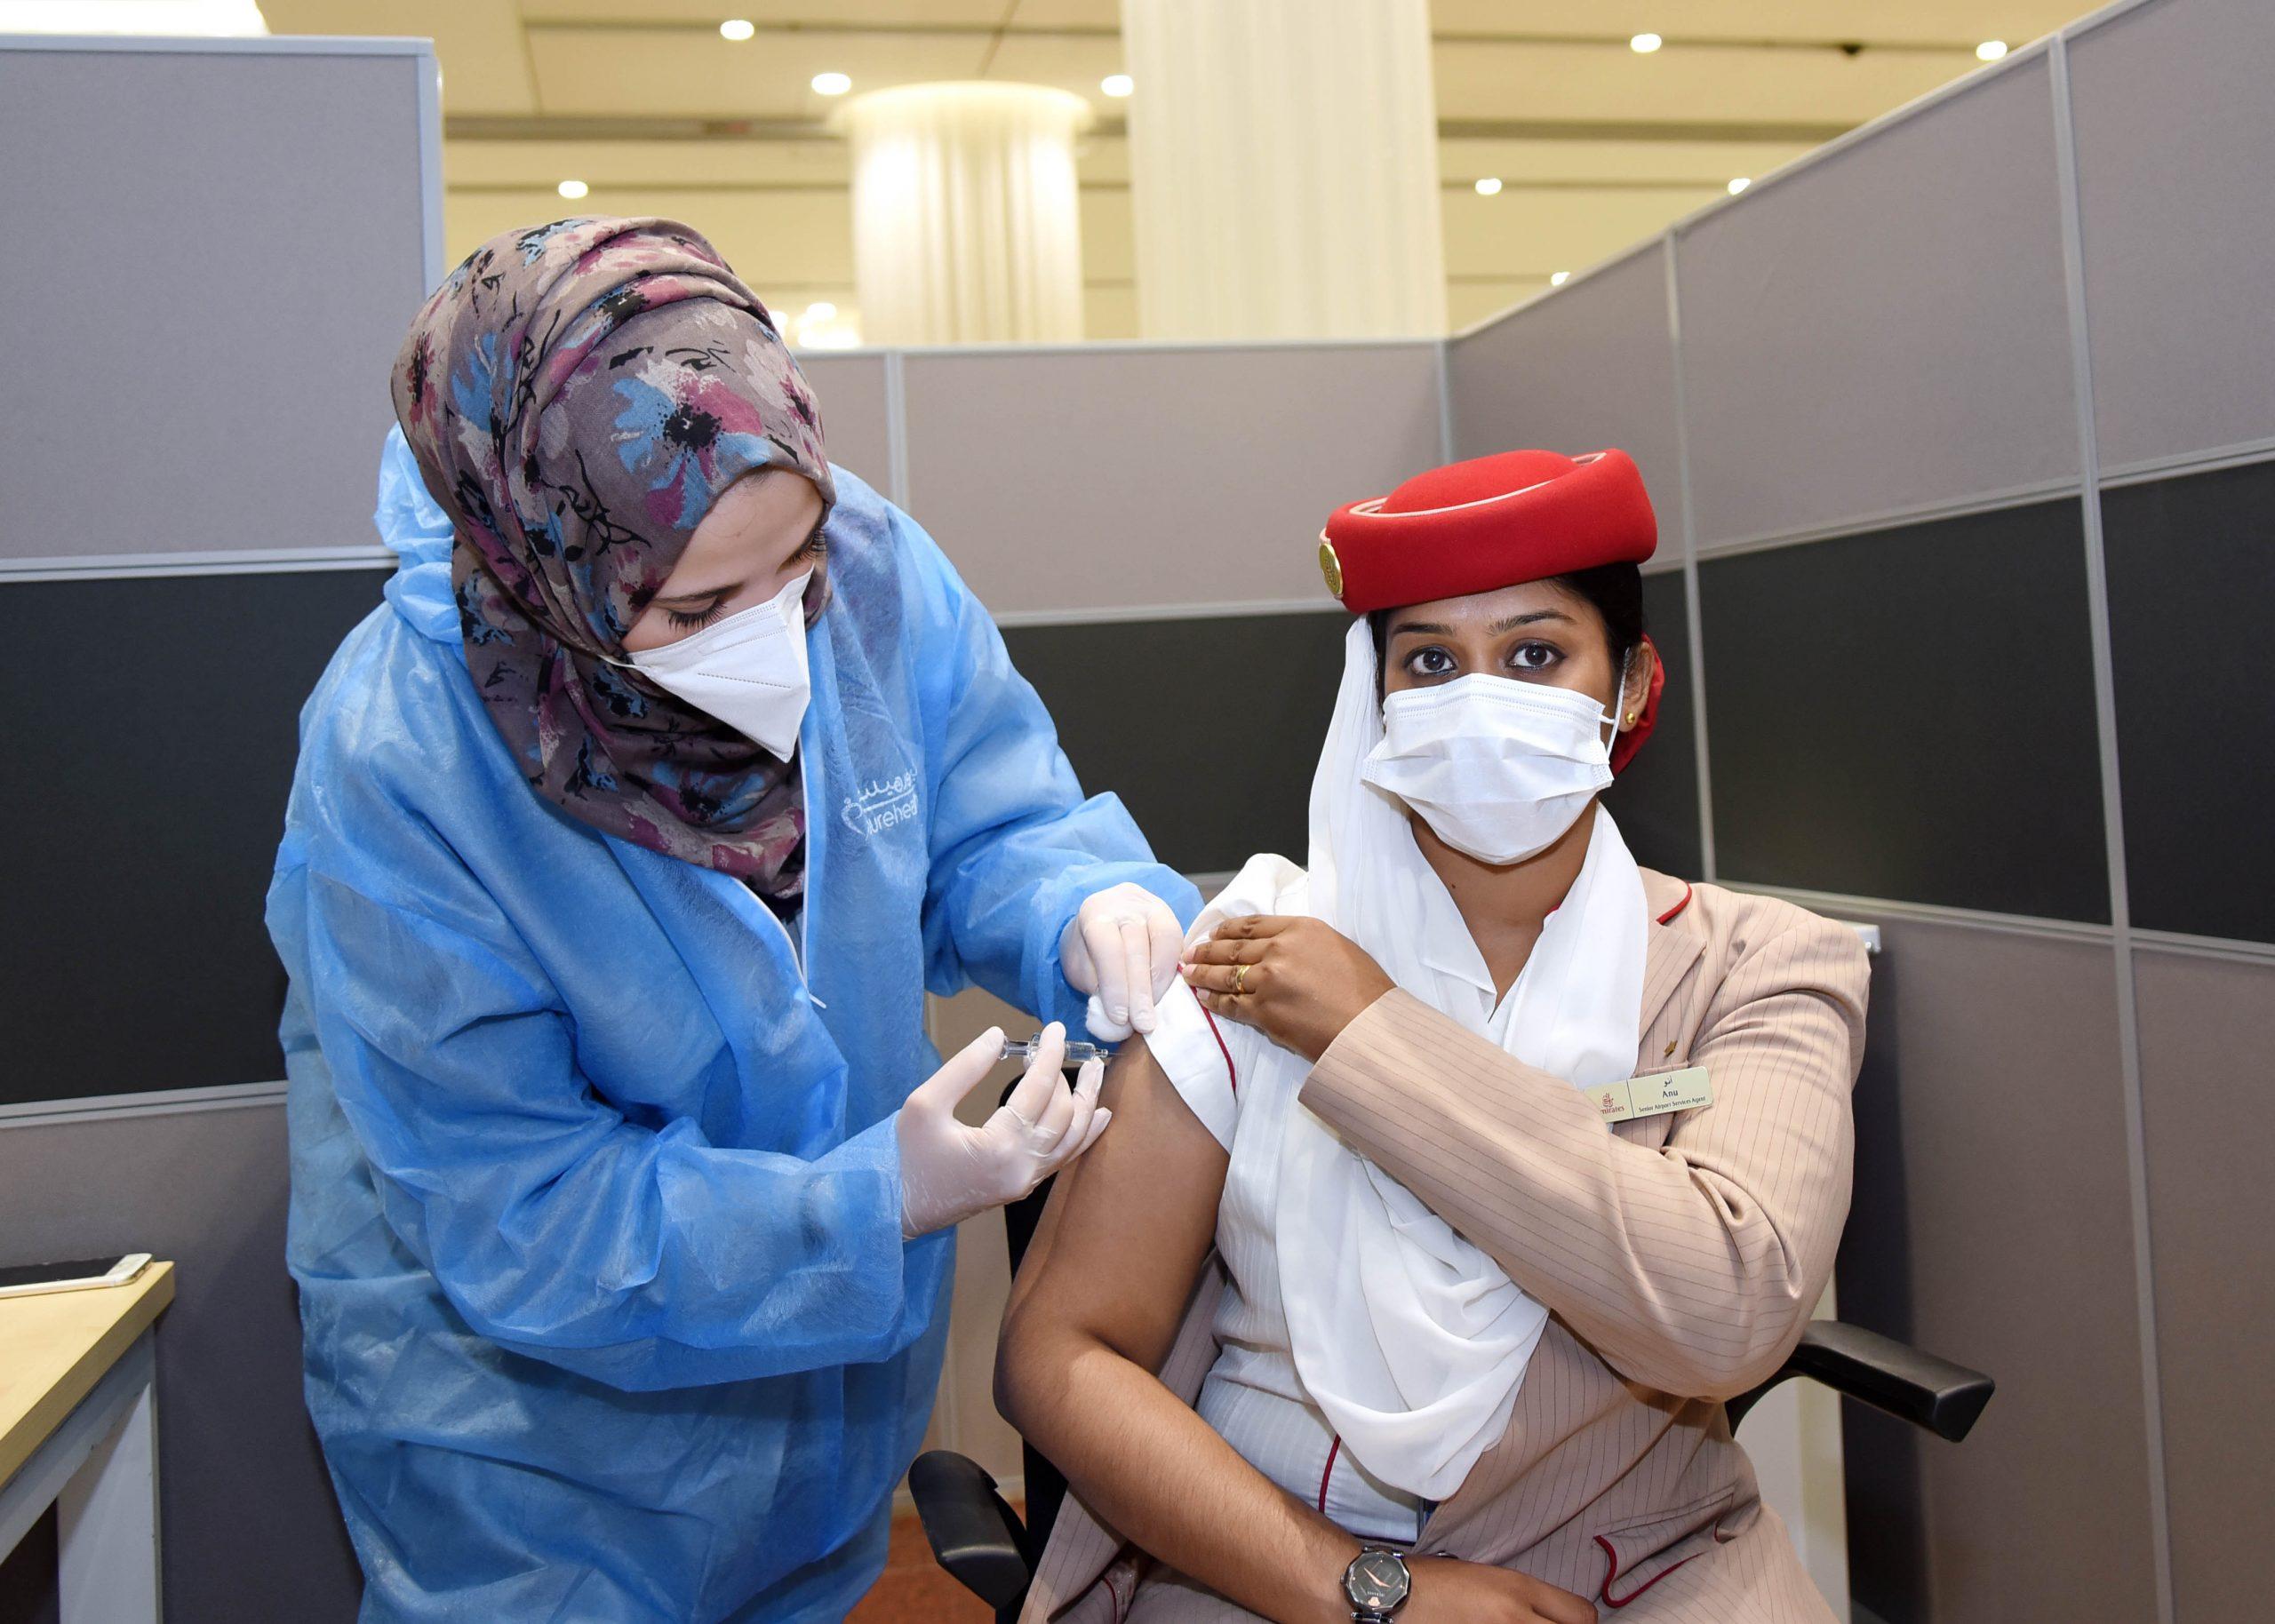 Ansat hos Emirates modtager COVID-19-vaccine. (Foto: Emirates Group)